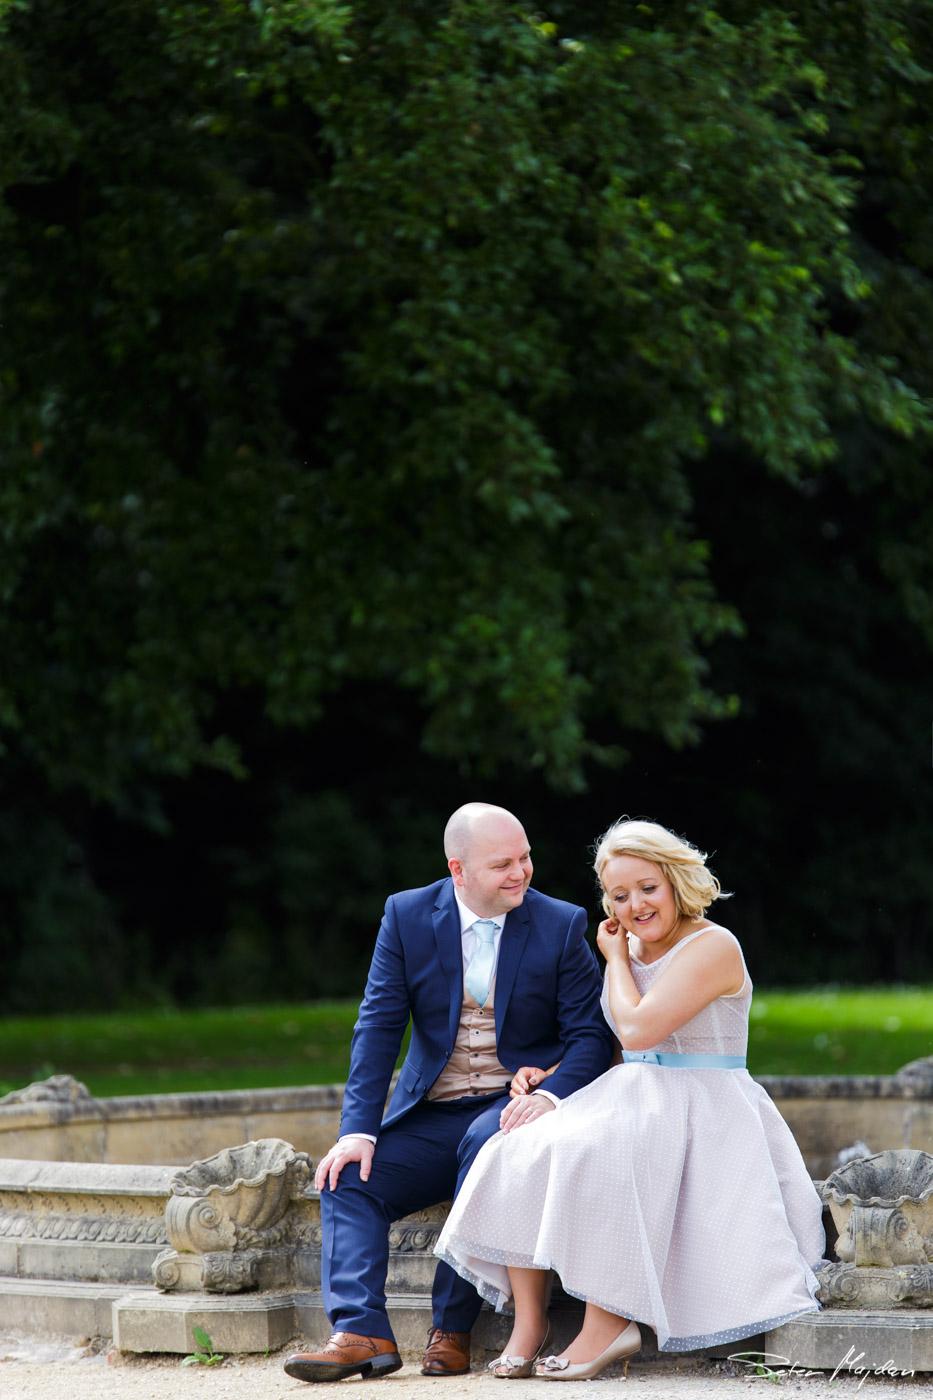 Colwick-hall-wedding-photography-34.jpg